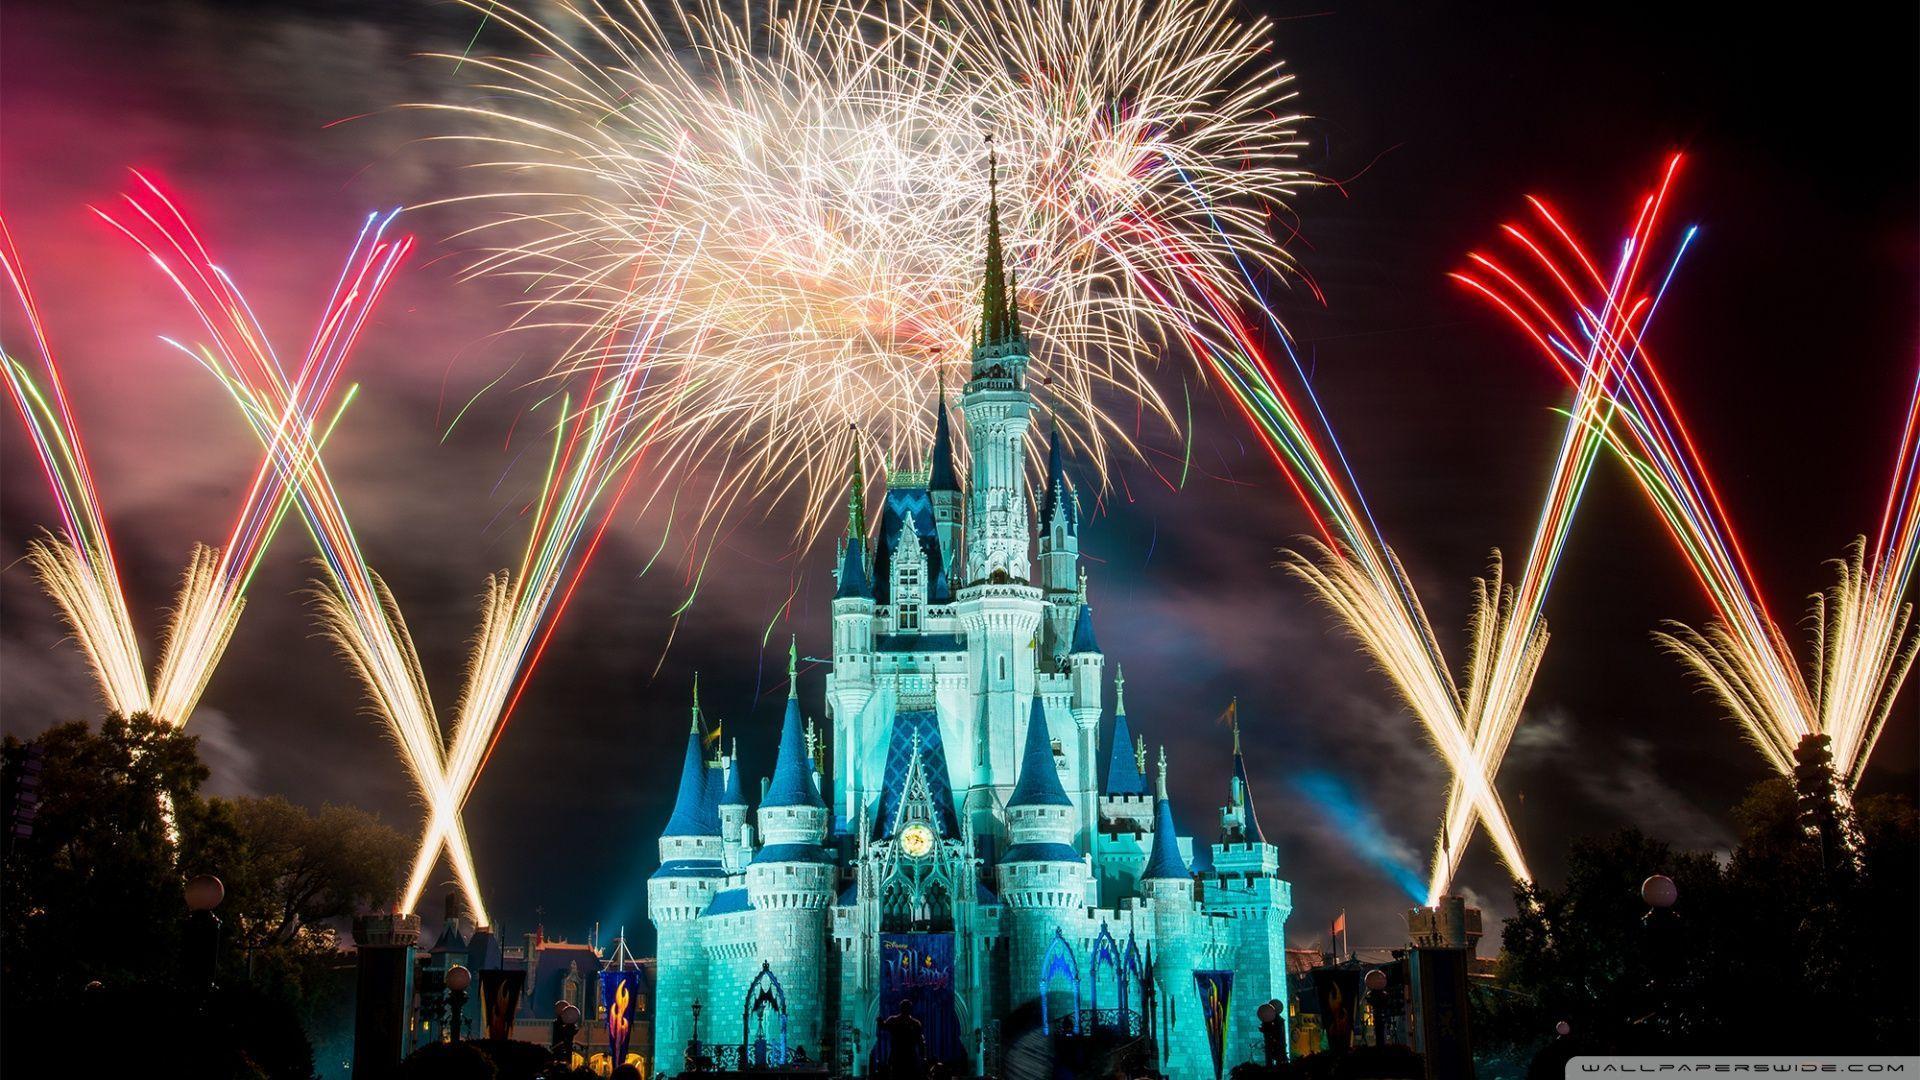 Magic Kingdom Wallpapers Top Free Magic Kingdom Backgrounds Wallpaperaccess